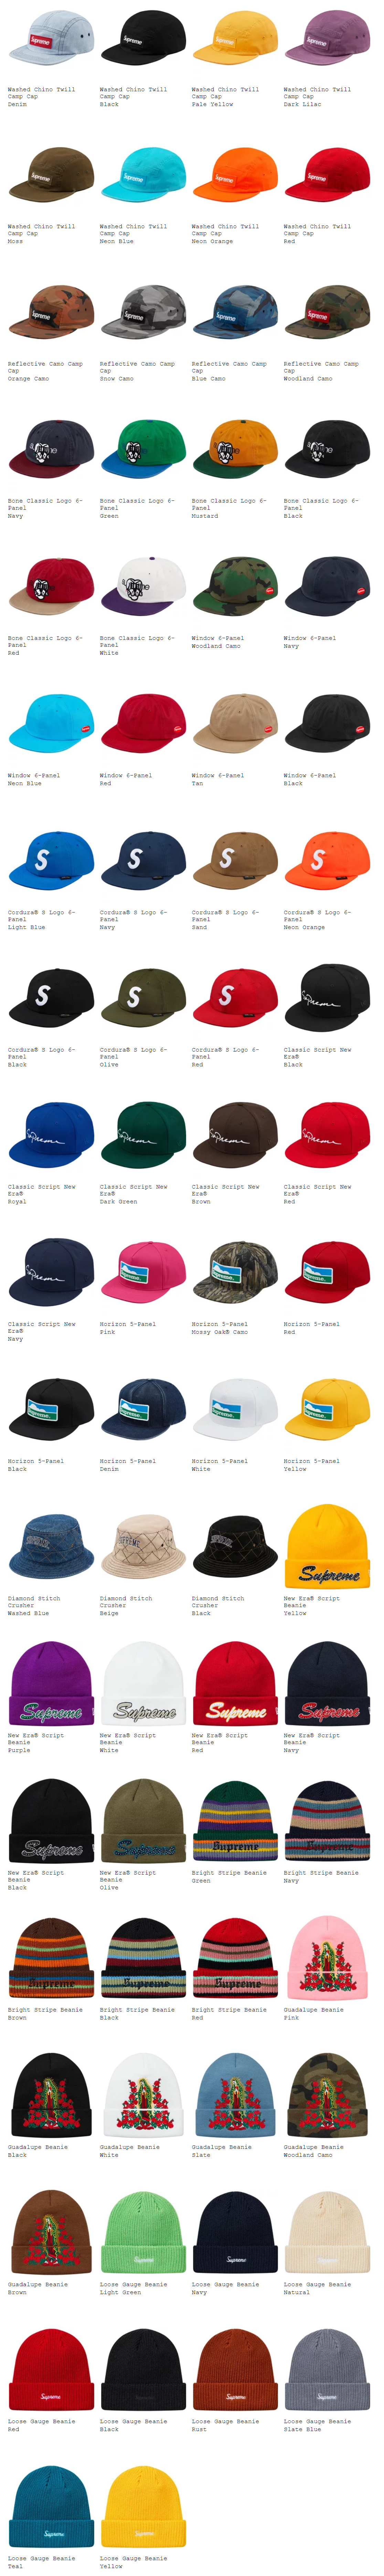 supreme シュプリーム 18fw week1(立ち上げ) オンライン配置 帽子・キャップ